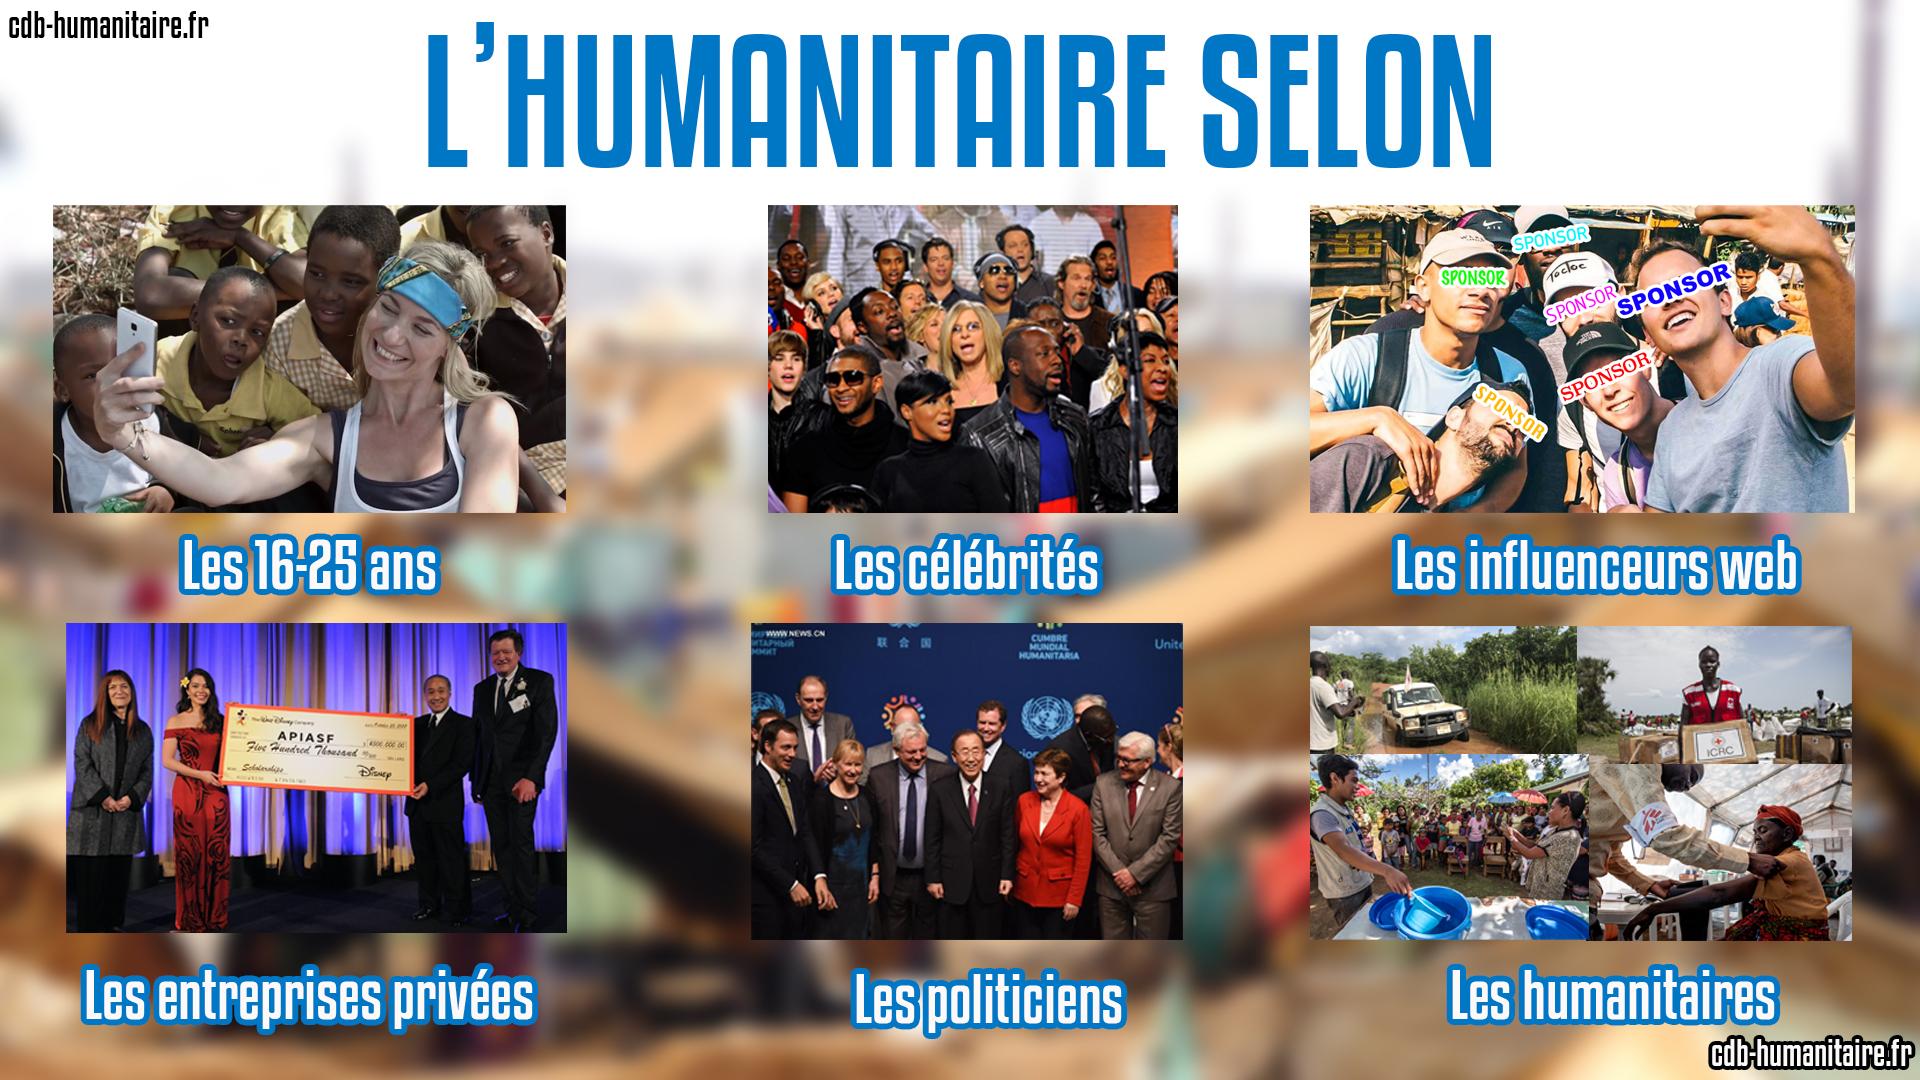 https://cdb-humanitaire.fr